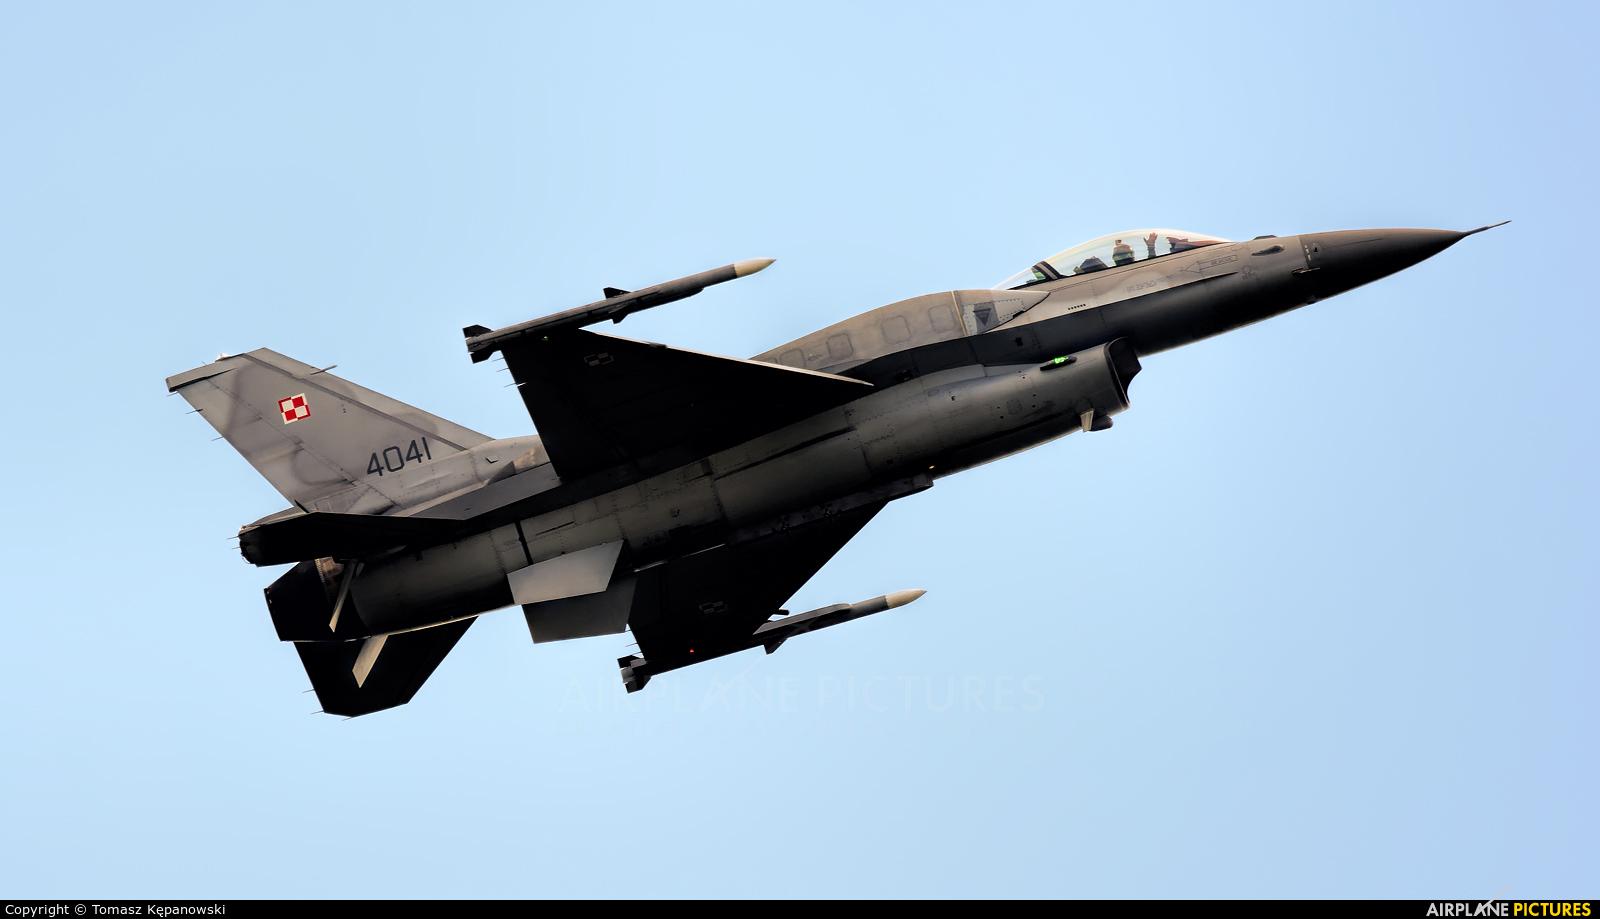 Poland - Air Force 4041 aircraft at Nowy Targ